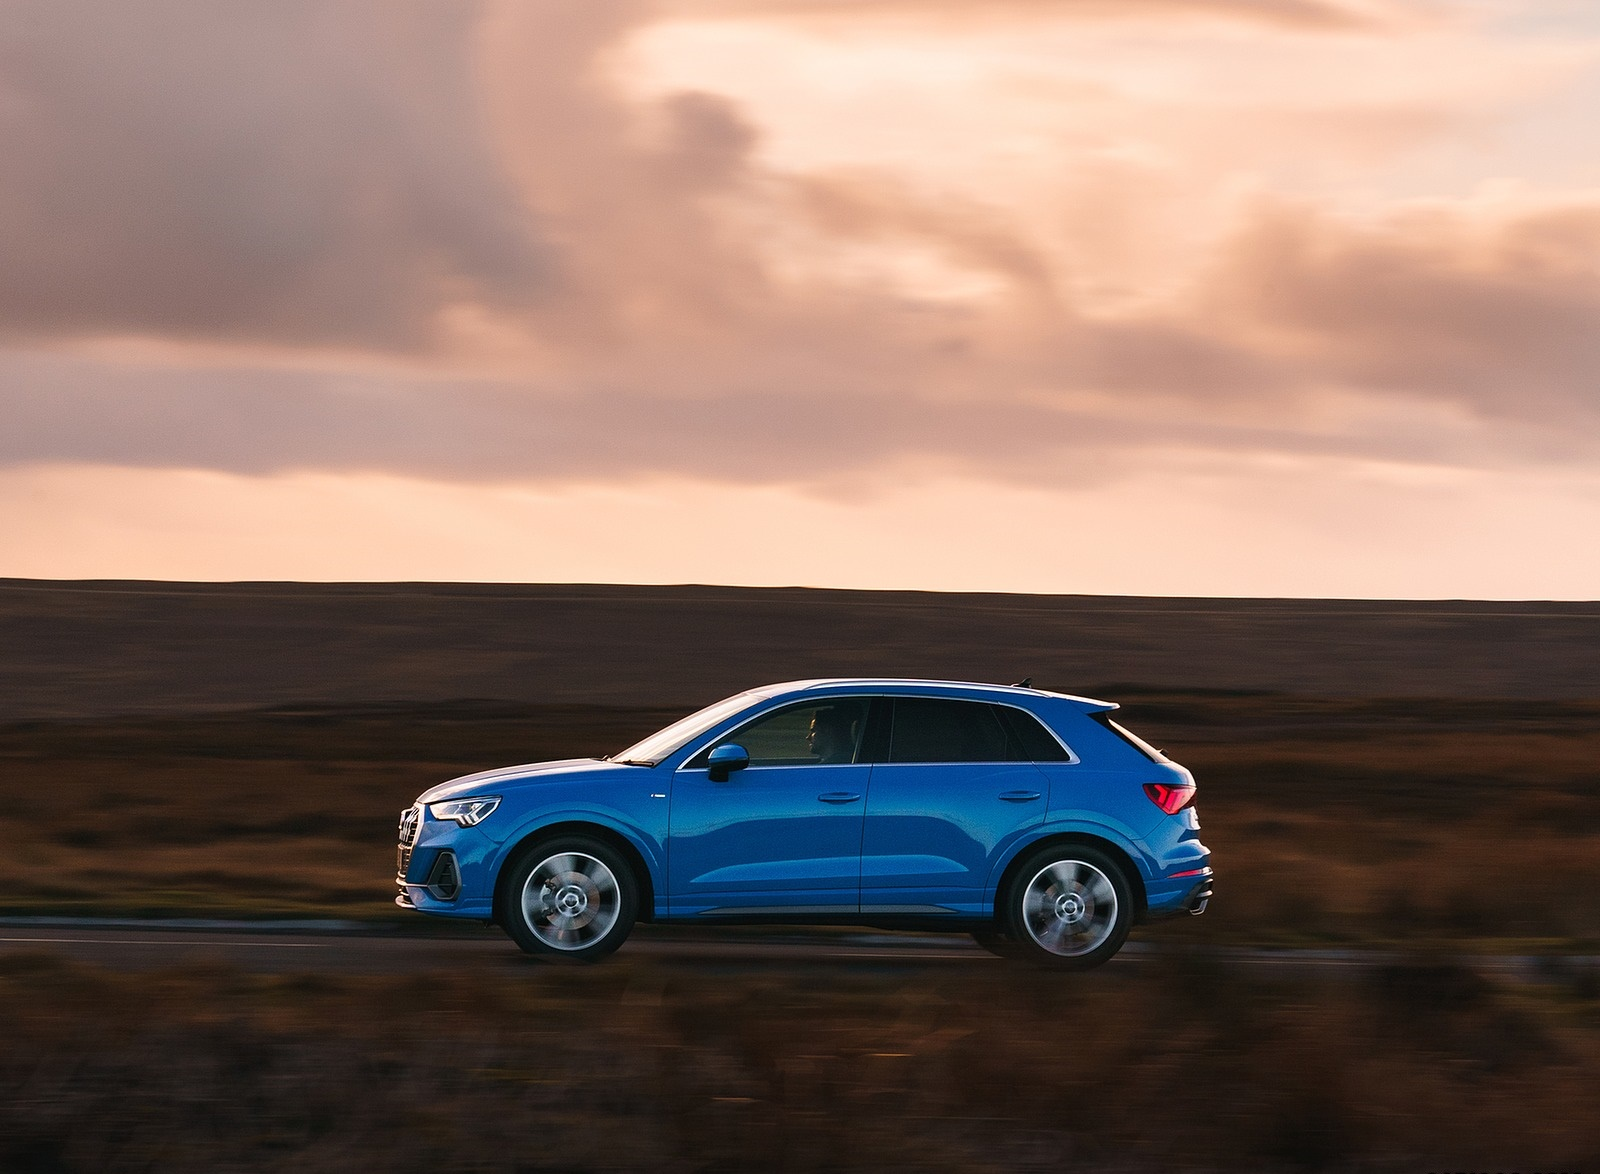 2019 Audi Q3 35 TFSI (UK-Spec) Side Wallpaper (10)